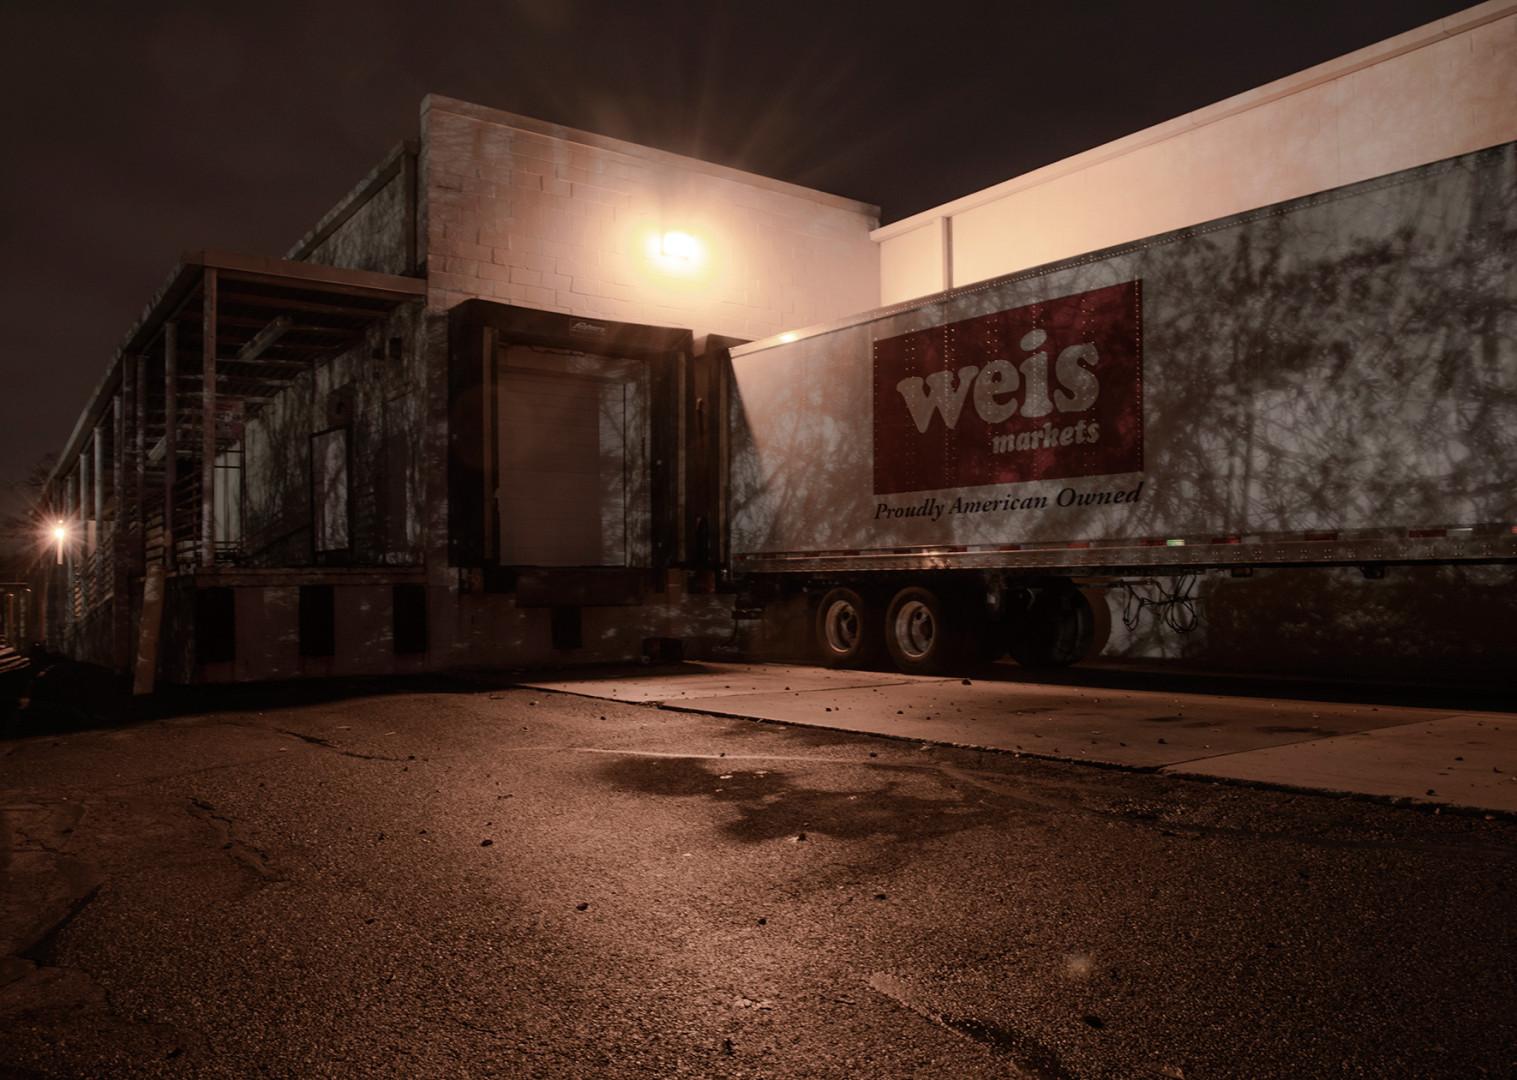 night shot, photo noir,Loading dock,easton,pennsylvania,lehigh valley,mood,moody